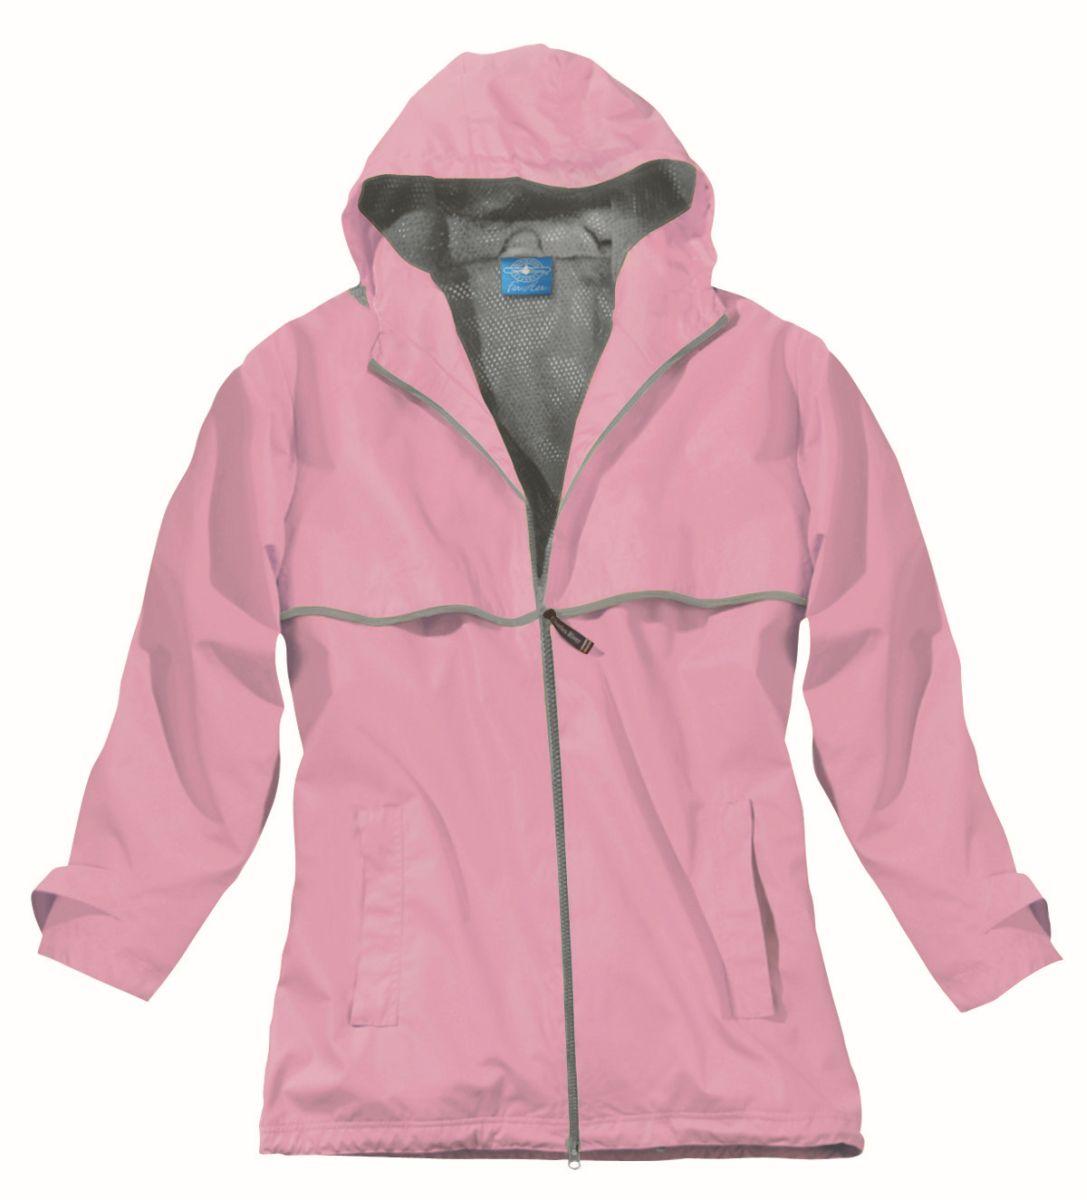 Coat clipart waterproof Jacket Women's Apparel River Charles